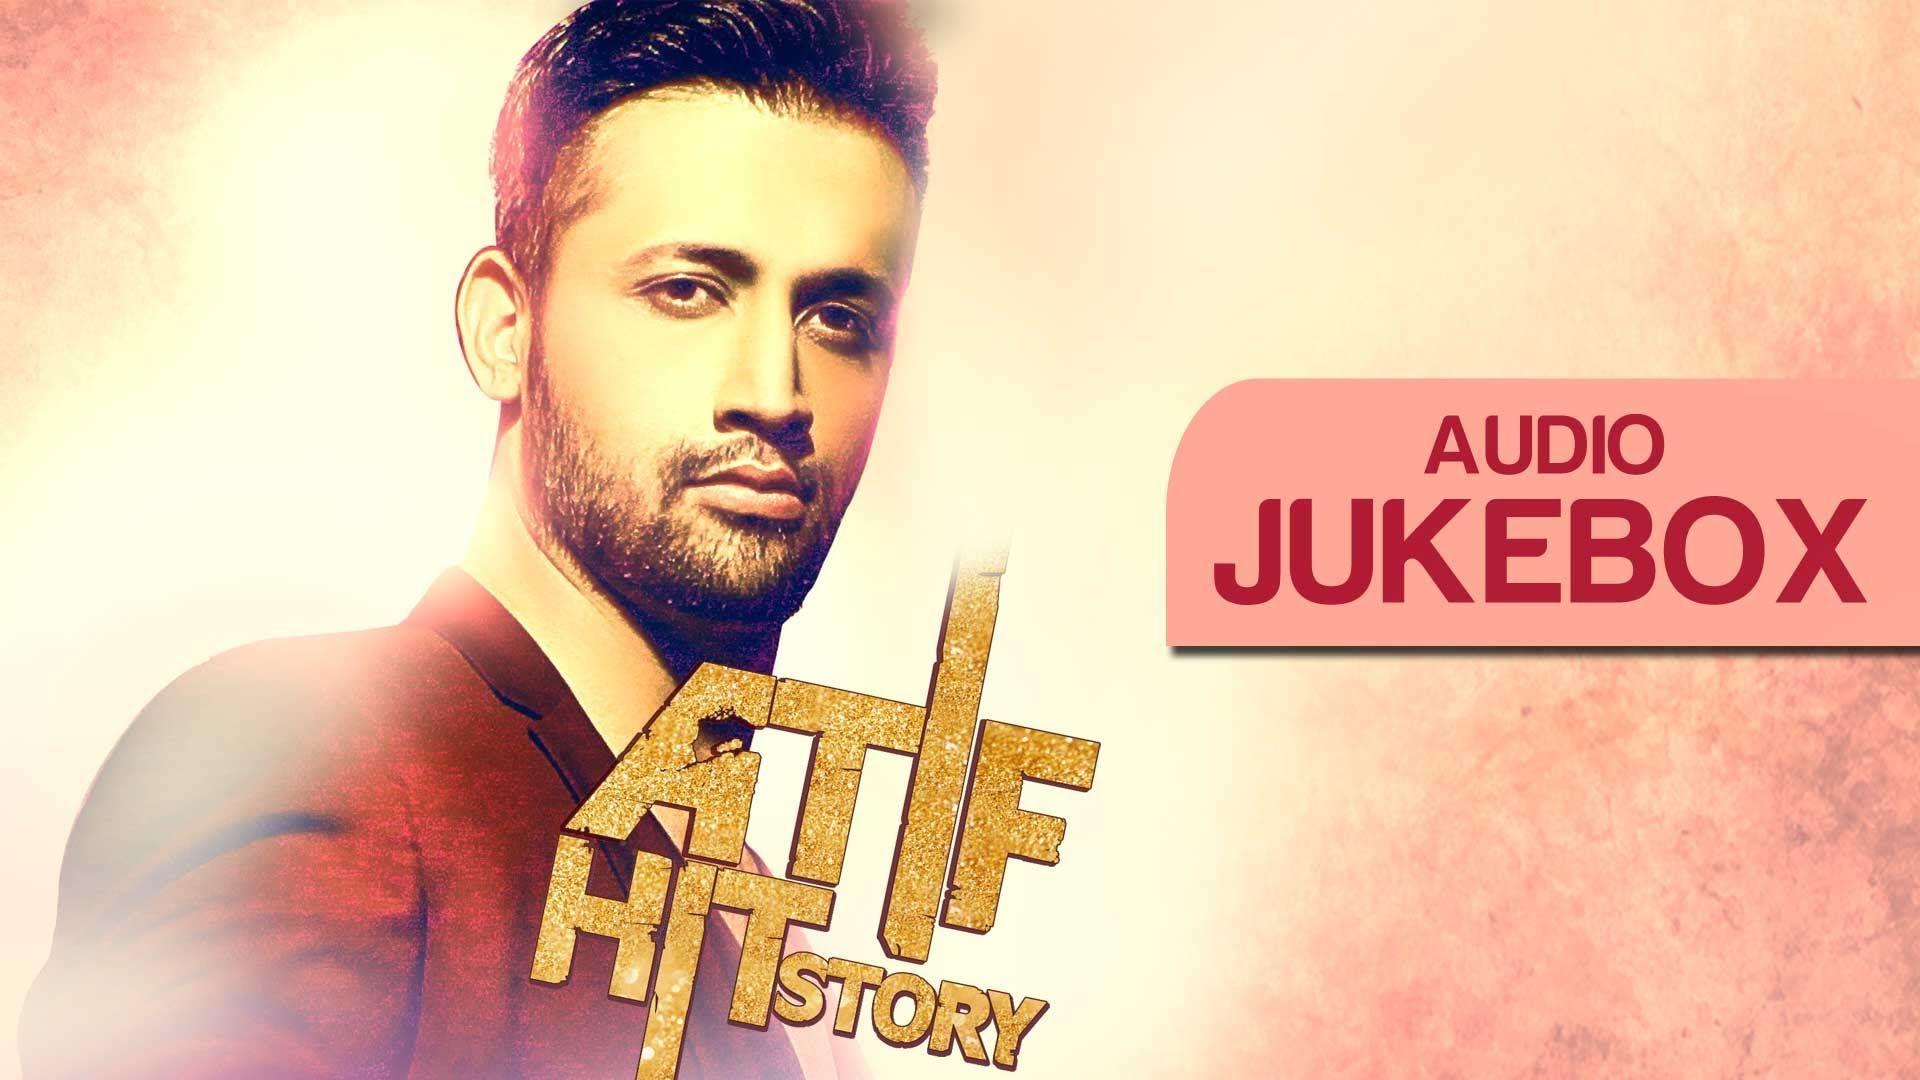 Atif Hit Story - Audio Jukebox - Best Atif Aslam Songs Non